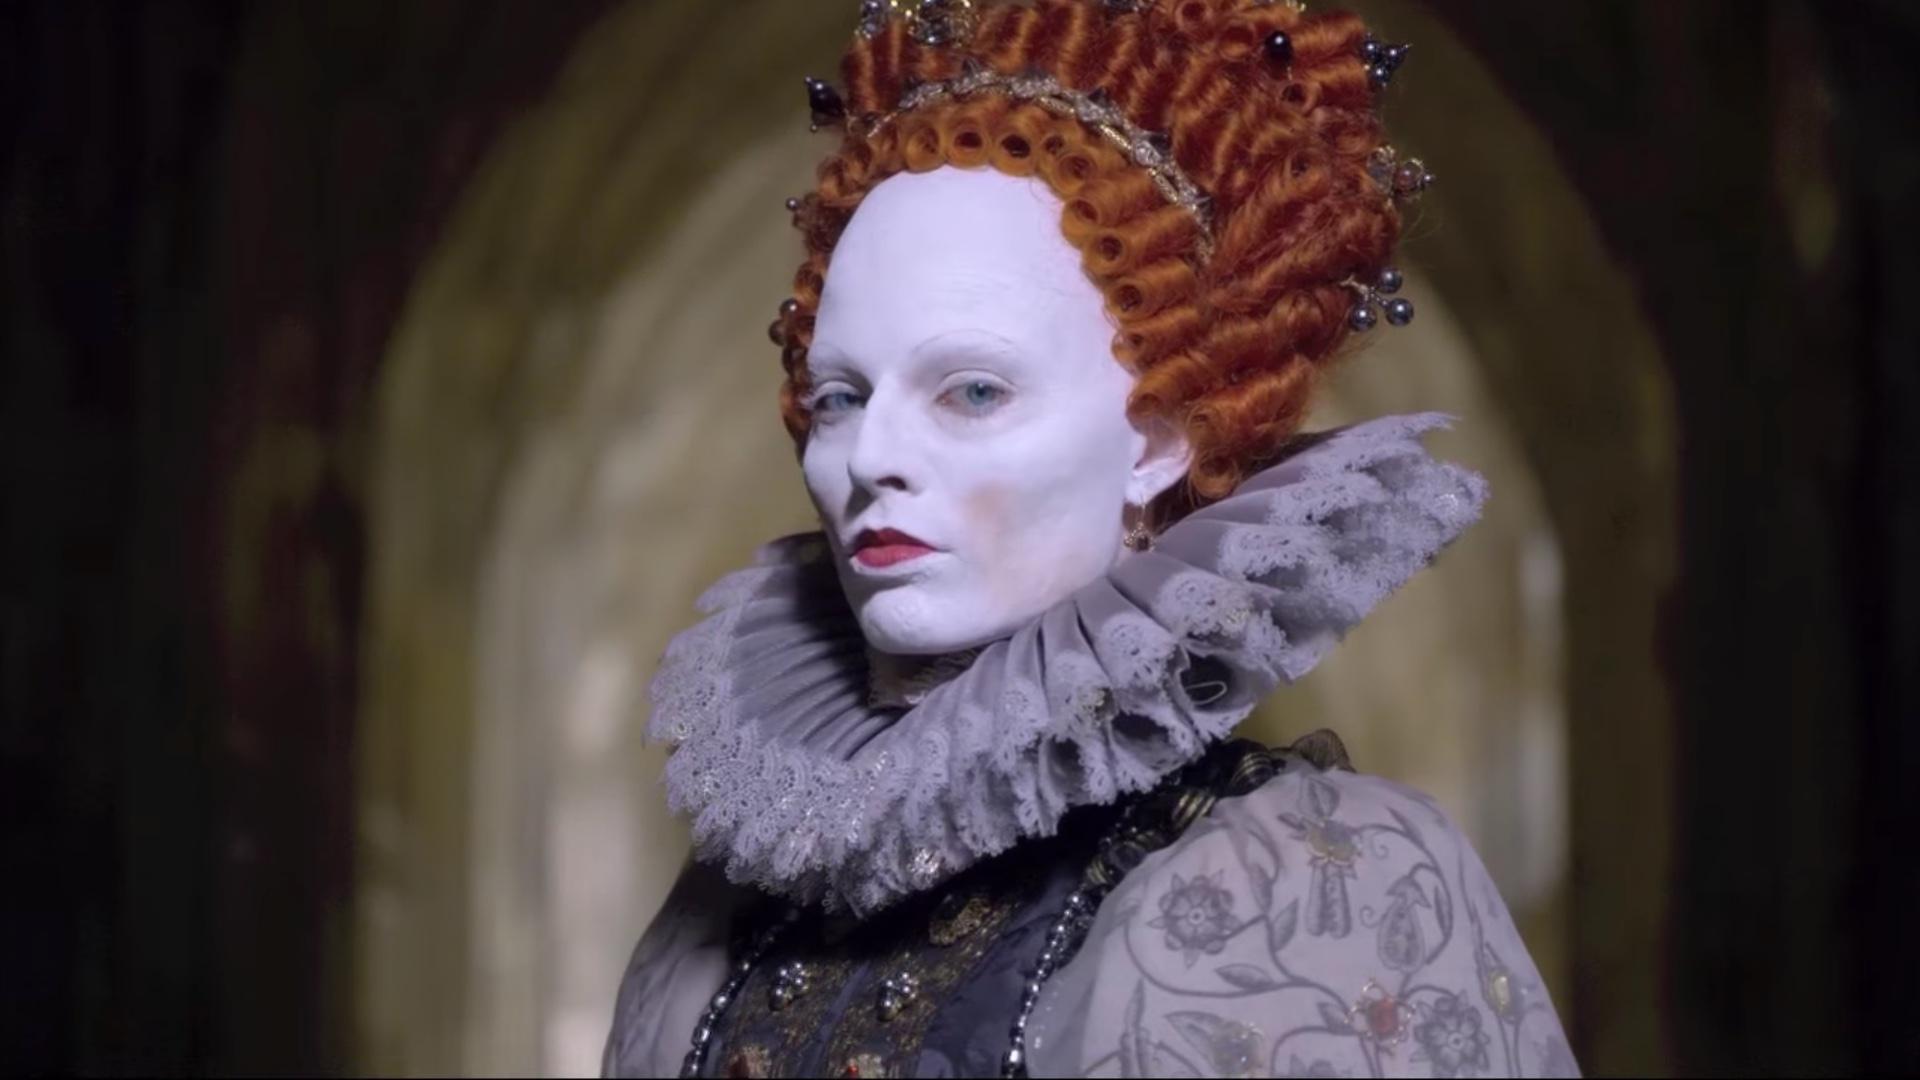 Трейлер: Мария - королева Шотландии (Две королевы) (Mary Queen of Scots)